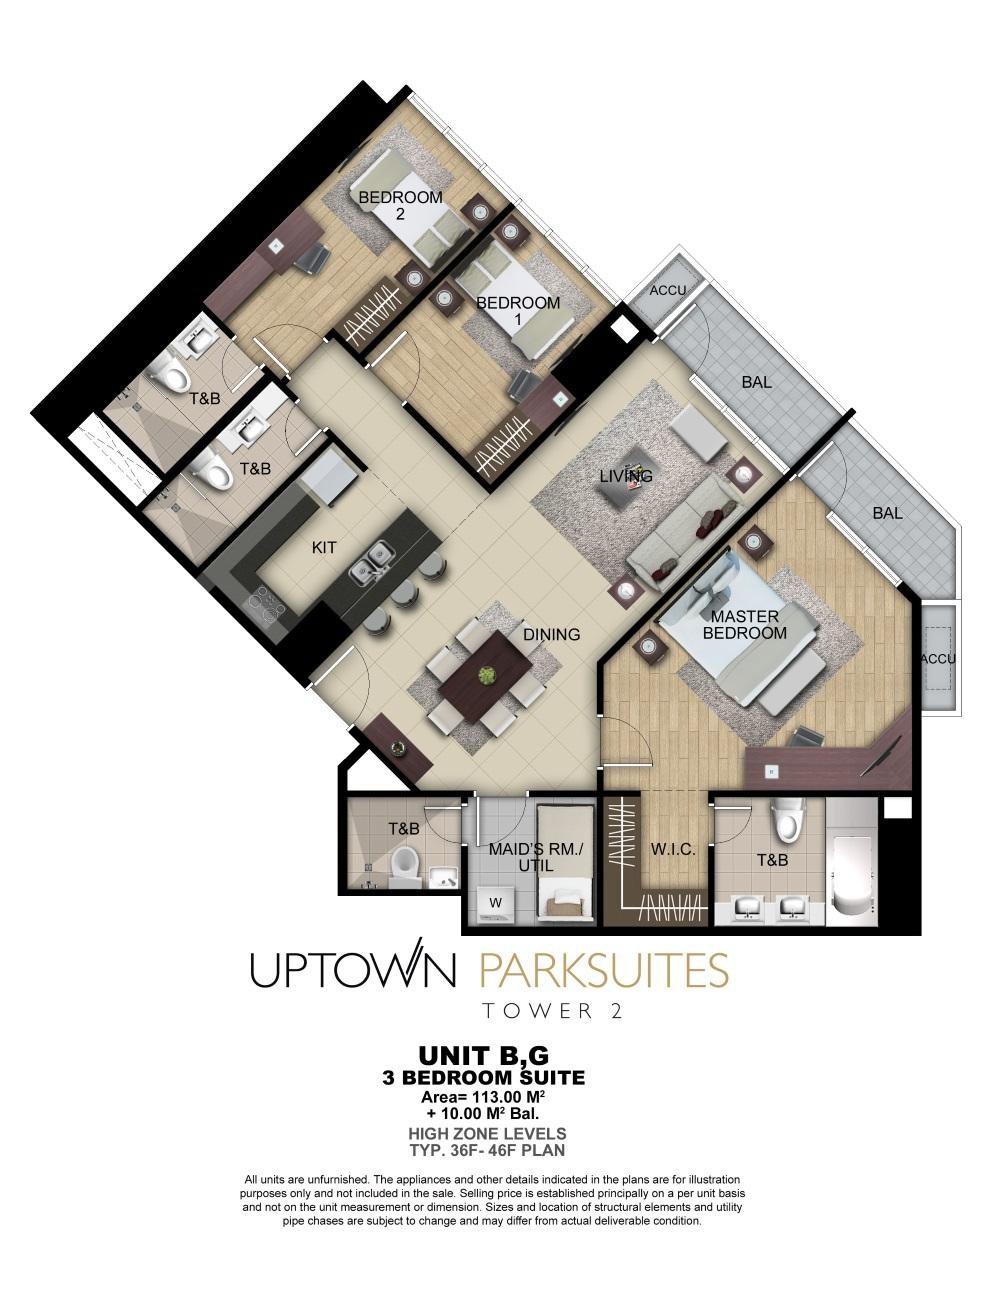 Uptown parksuites tower 2 floor plans for G plan bedroom suite